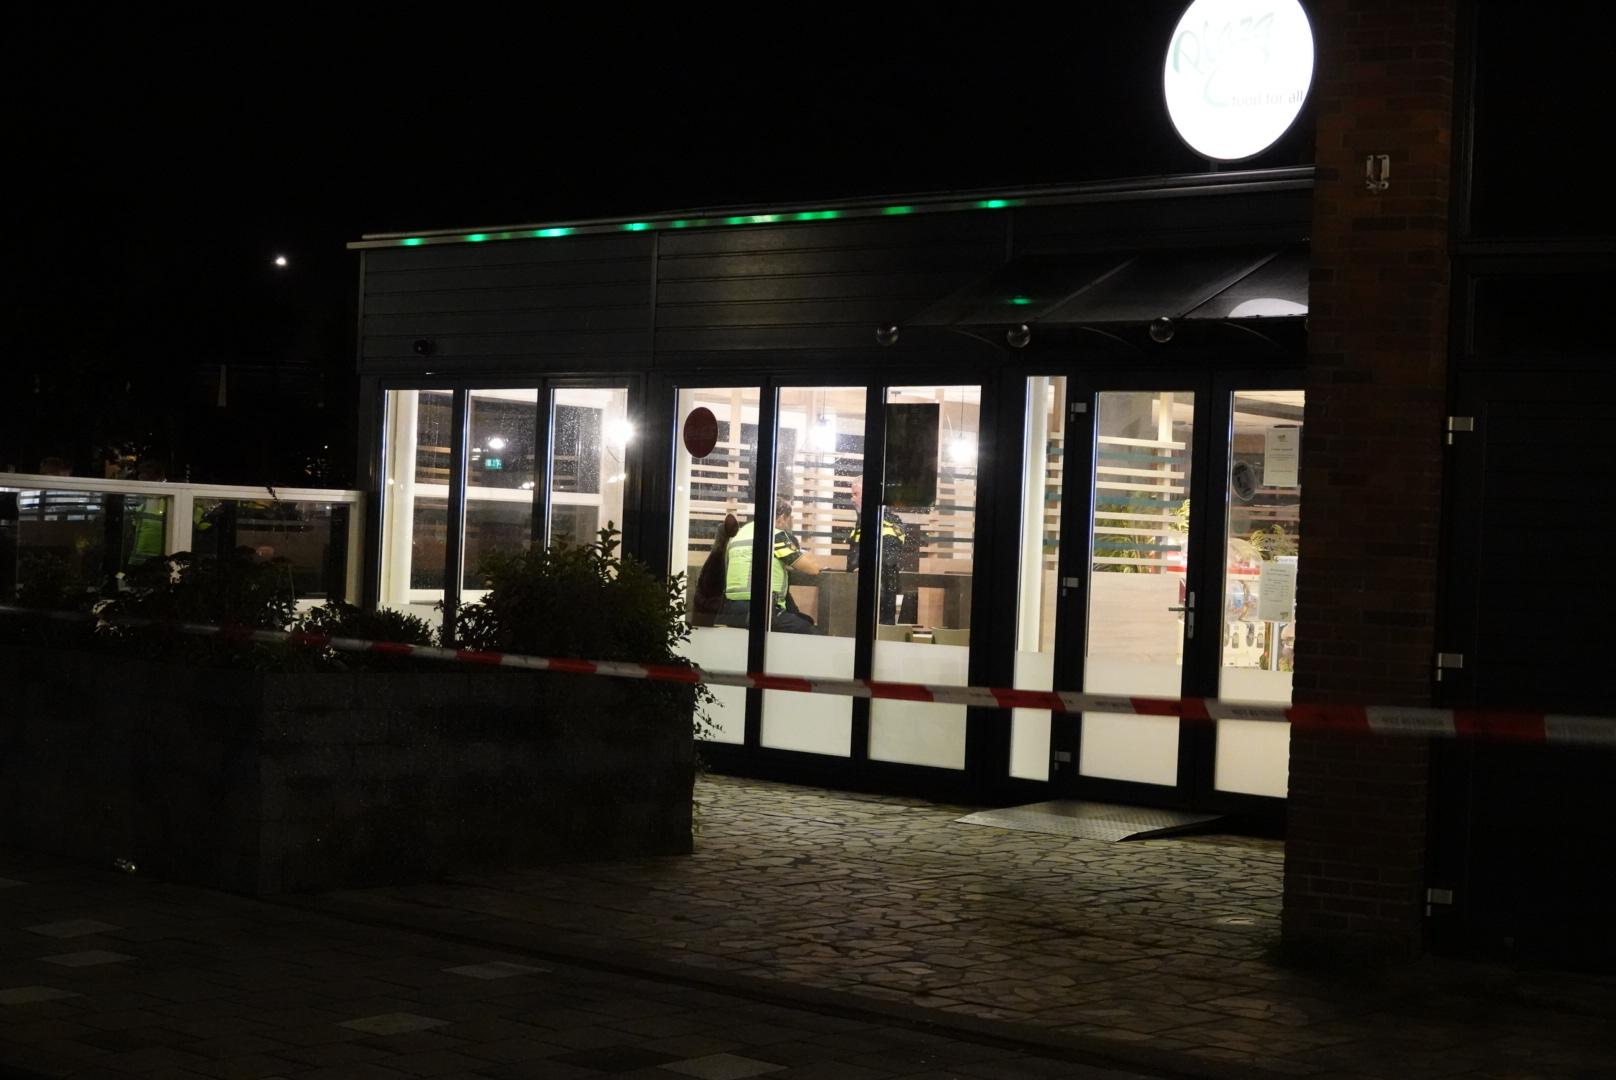 Gewapende overval op snackbar in Heerhugowaard [update]